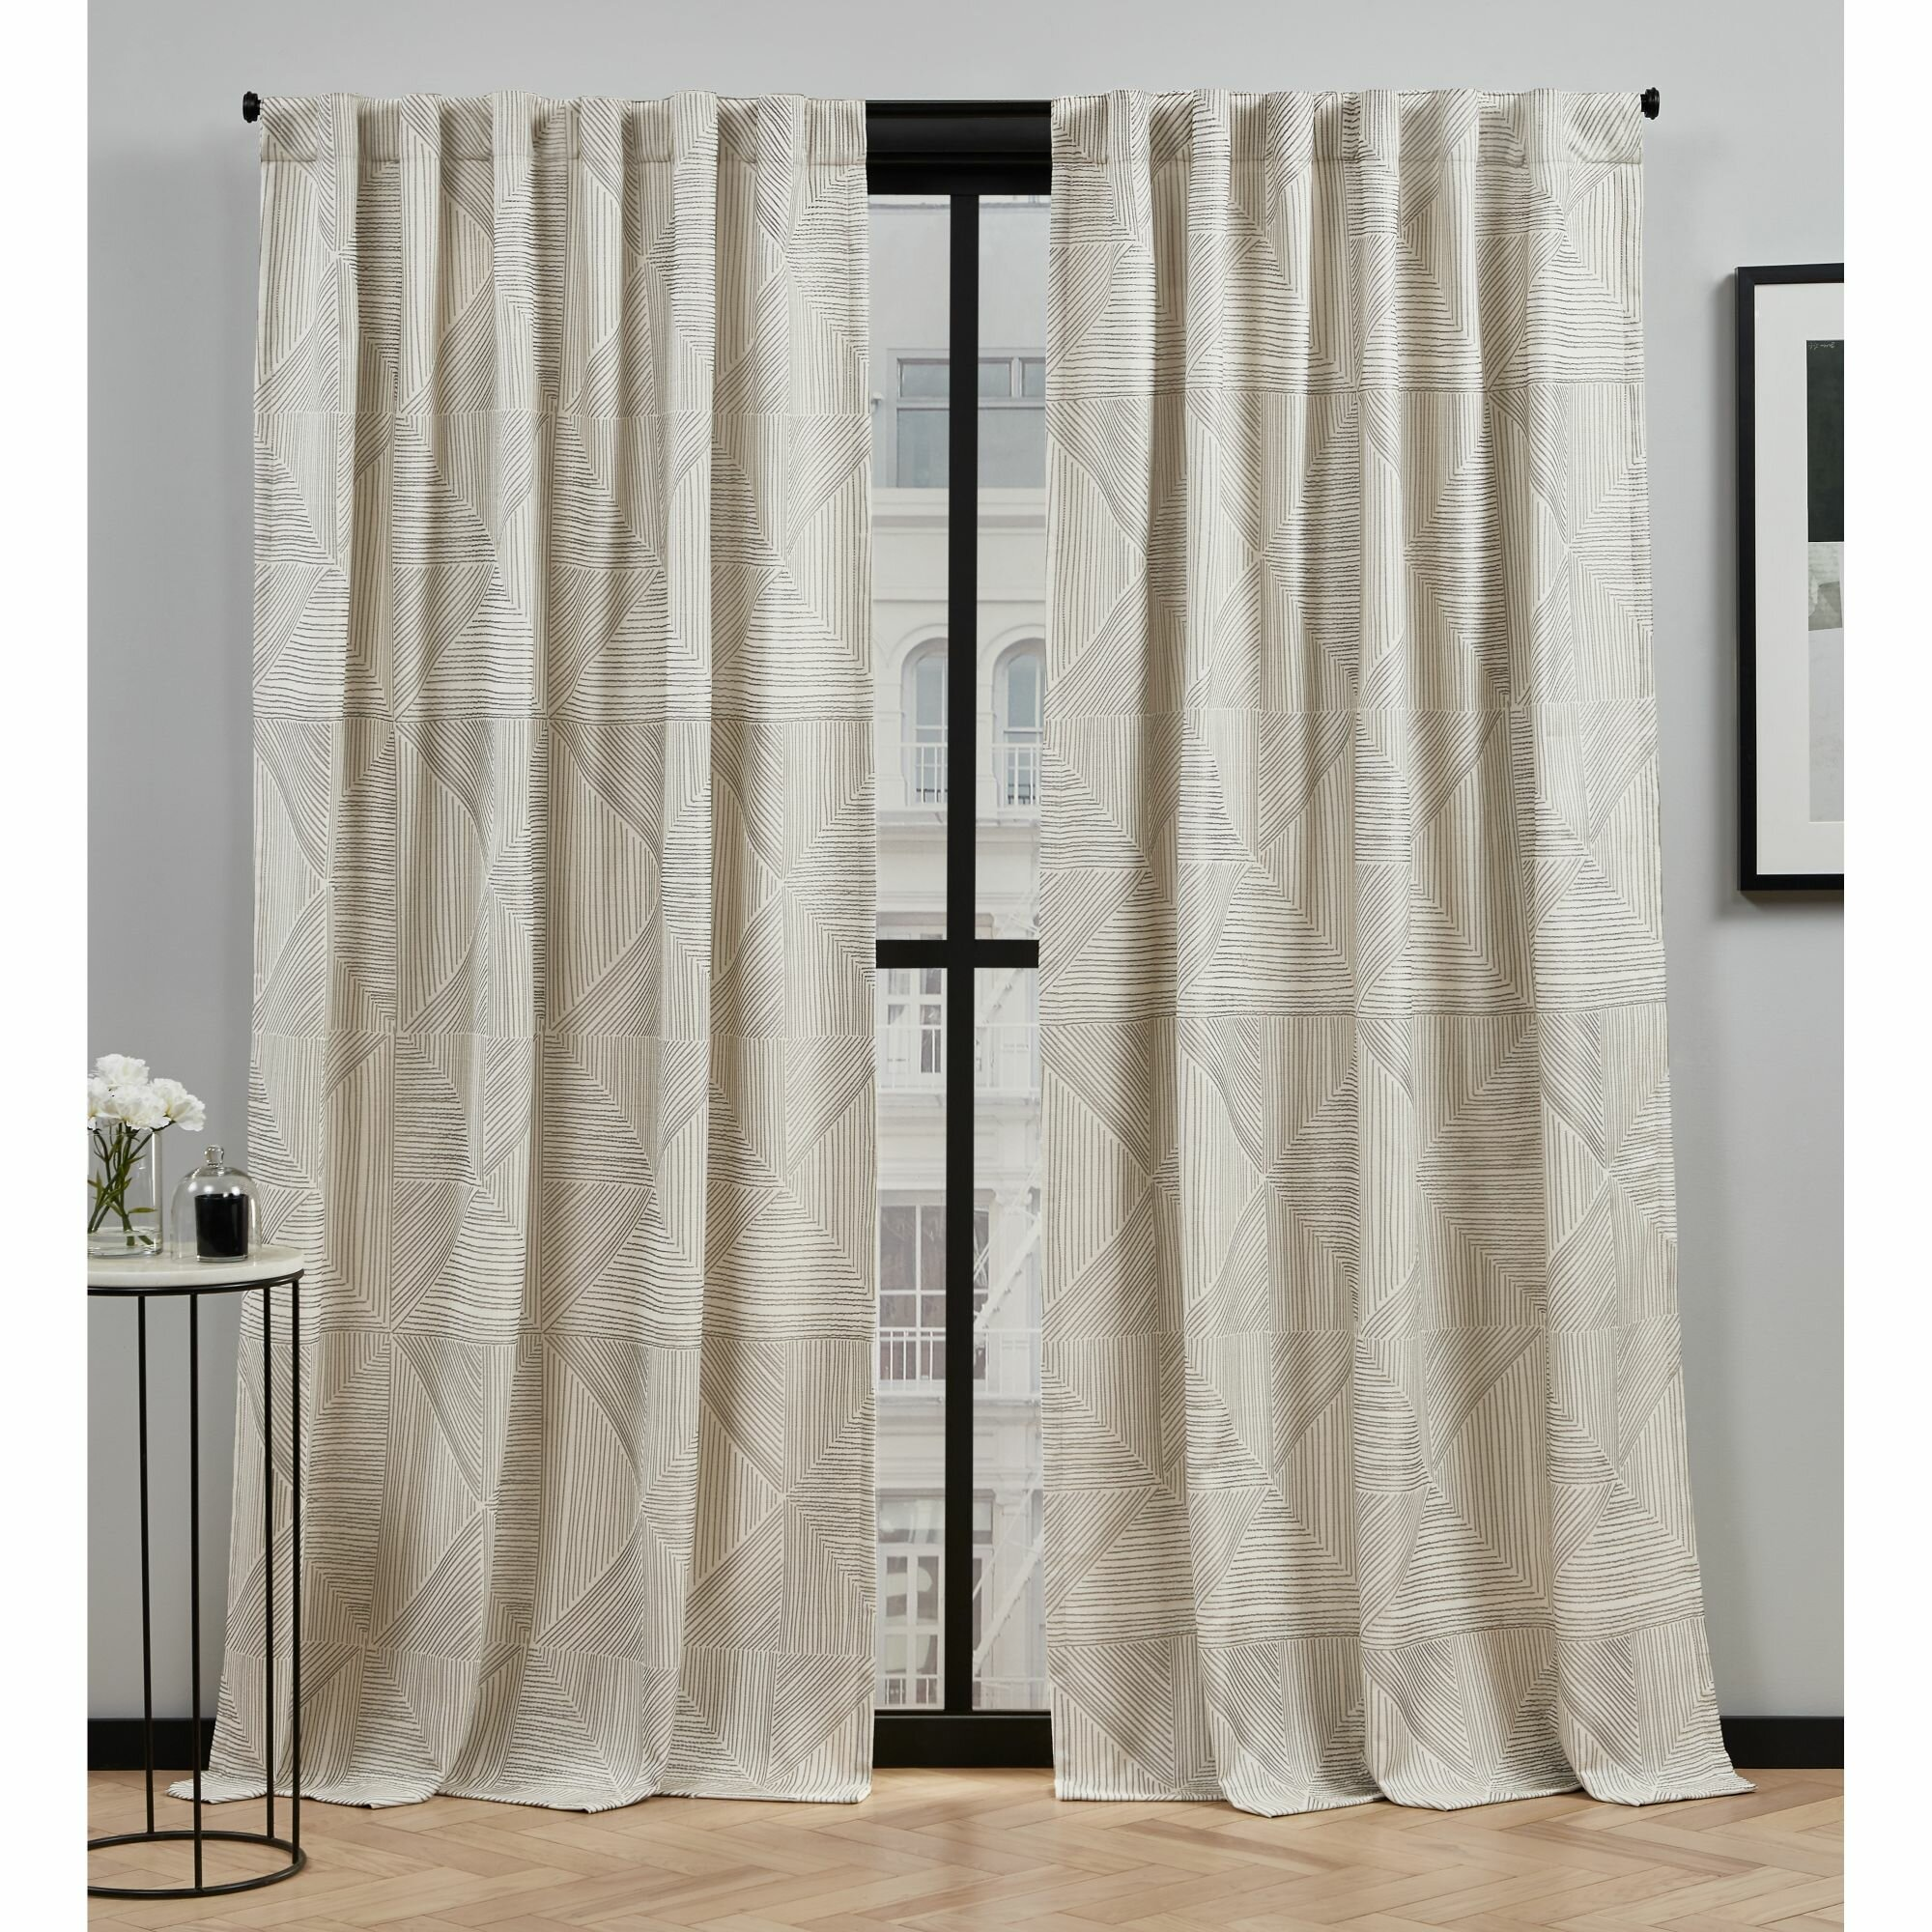 Mudd Geometric Semi Sheer Rod Pocket Curtain Panels Reviews Allmodern